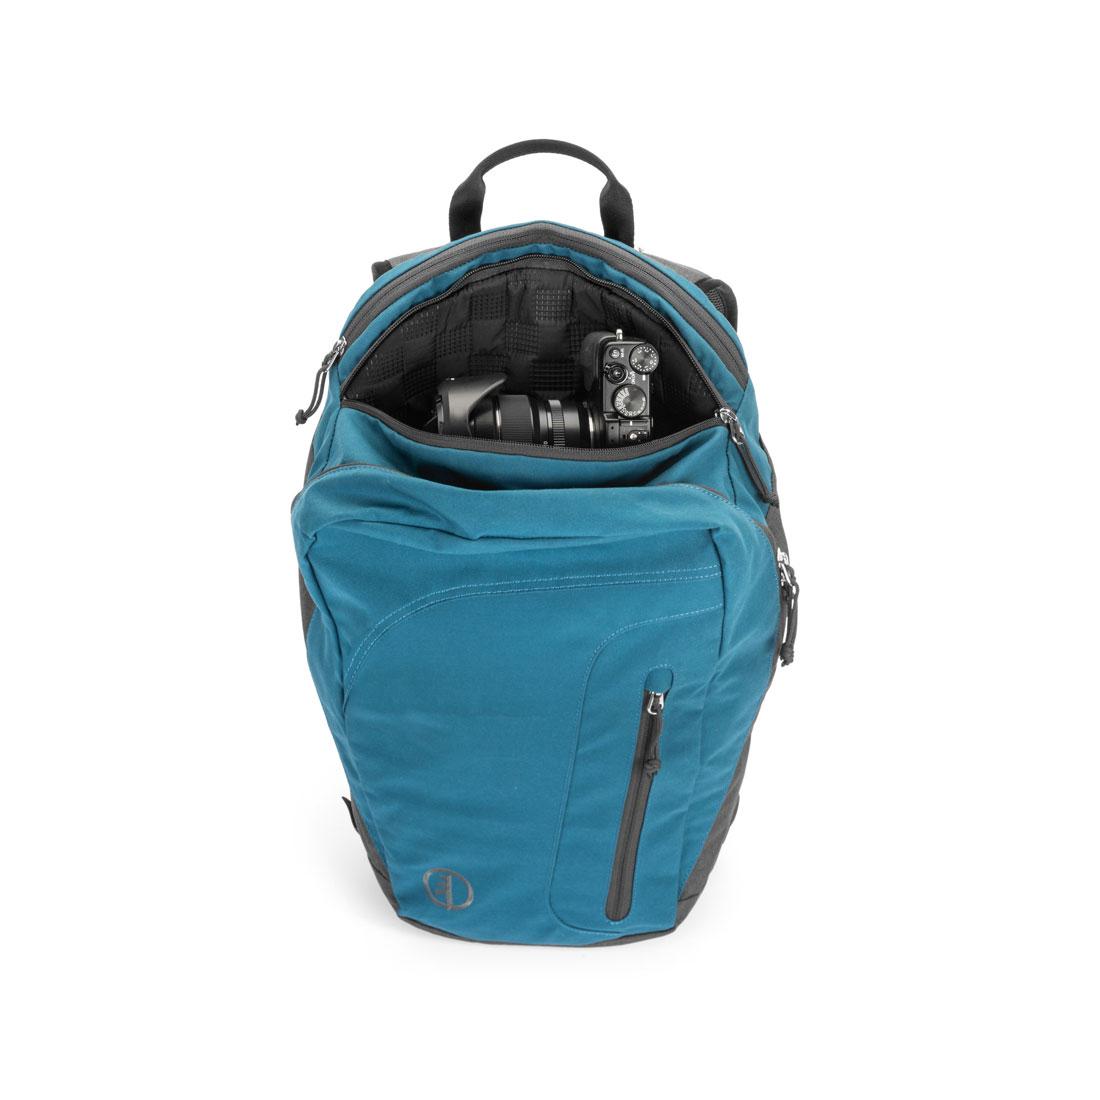 Le sac à dos photo hybride Tamrac Hoodoo 18.